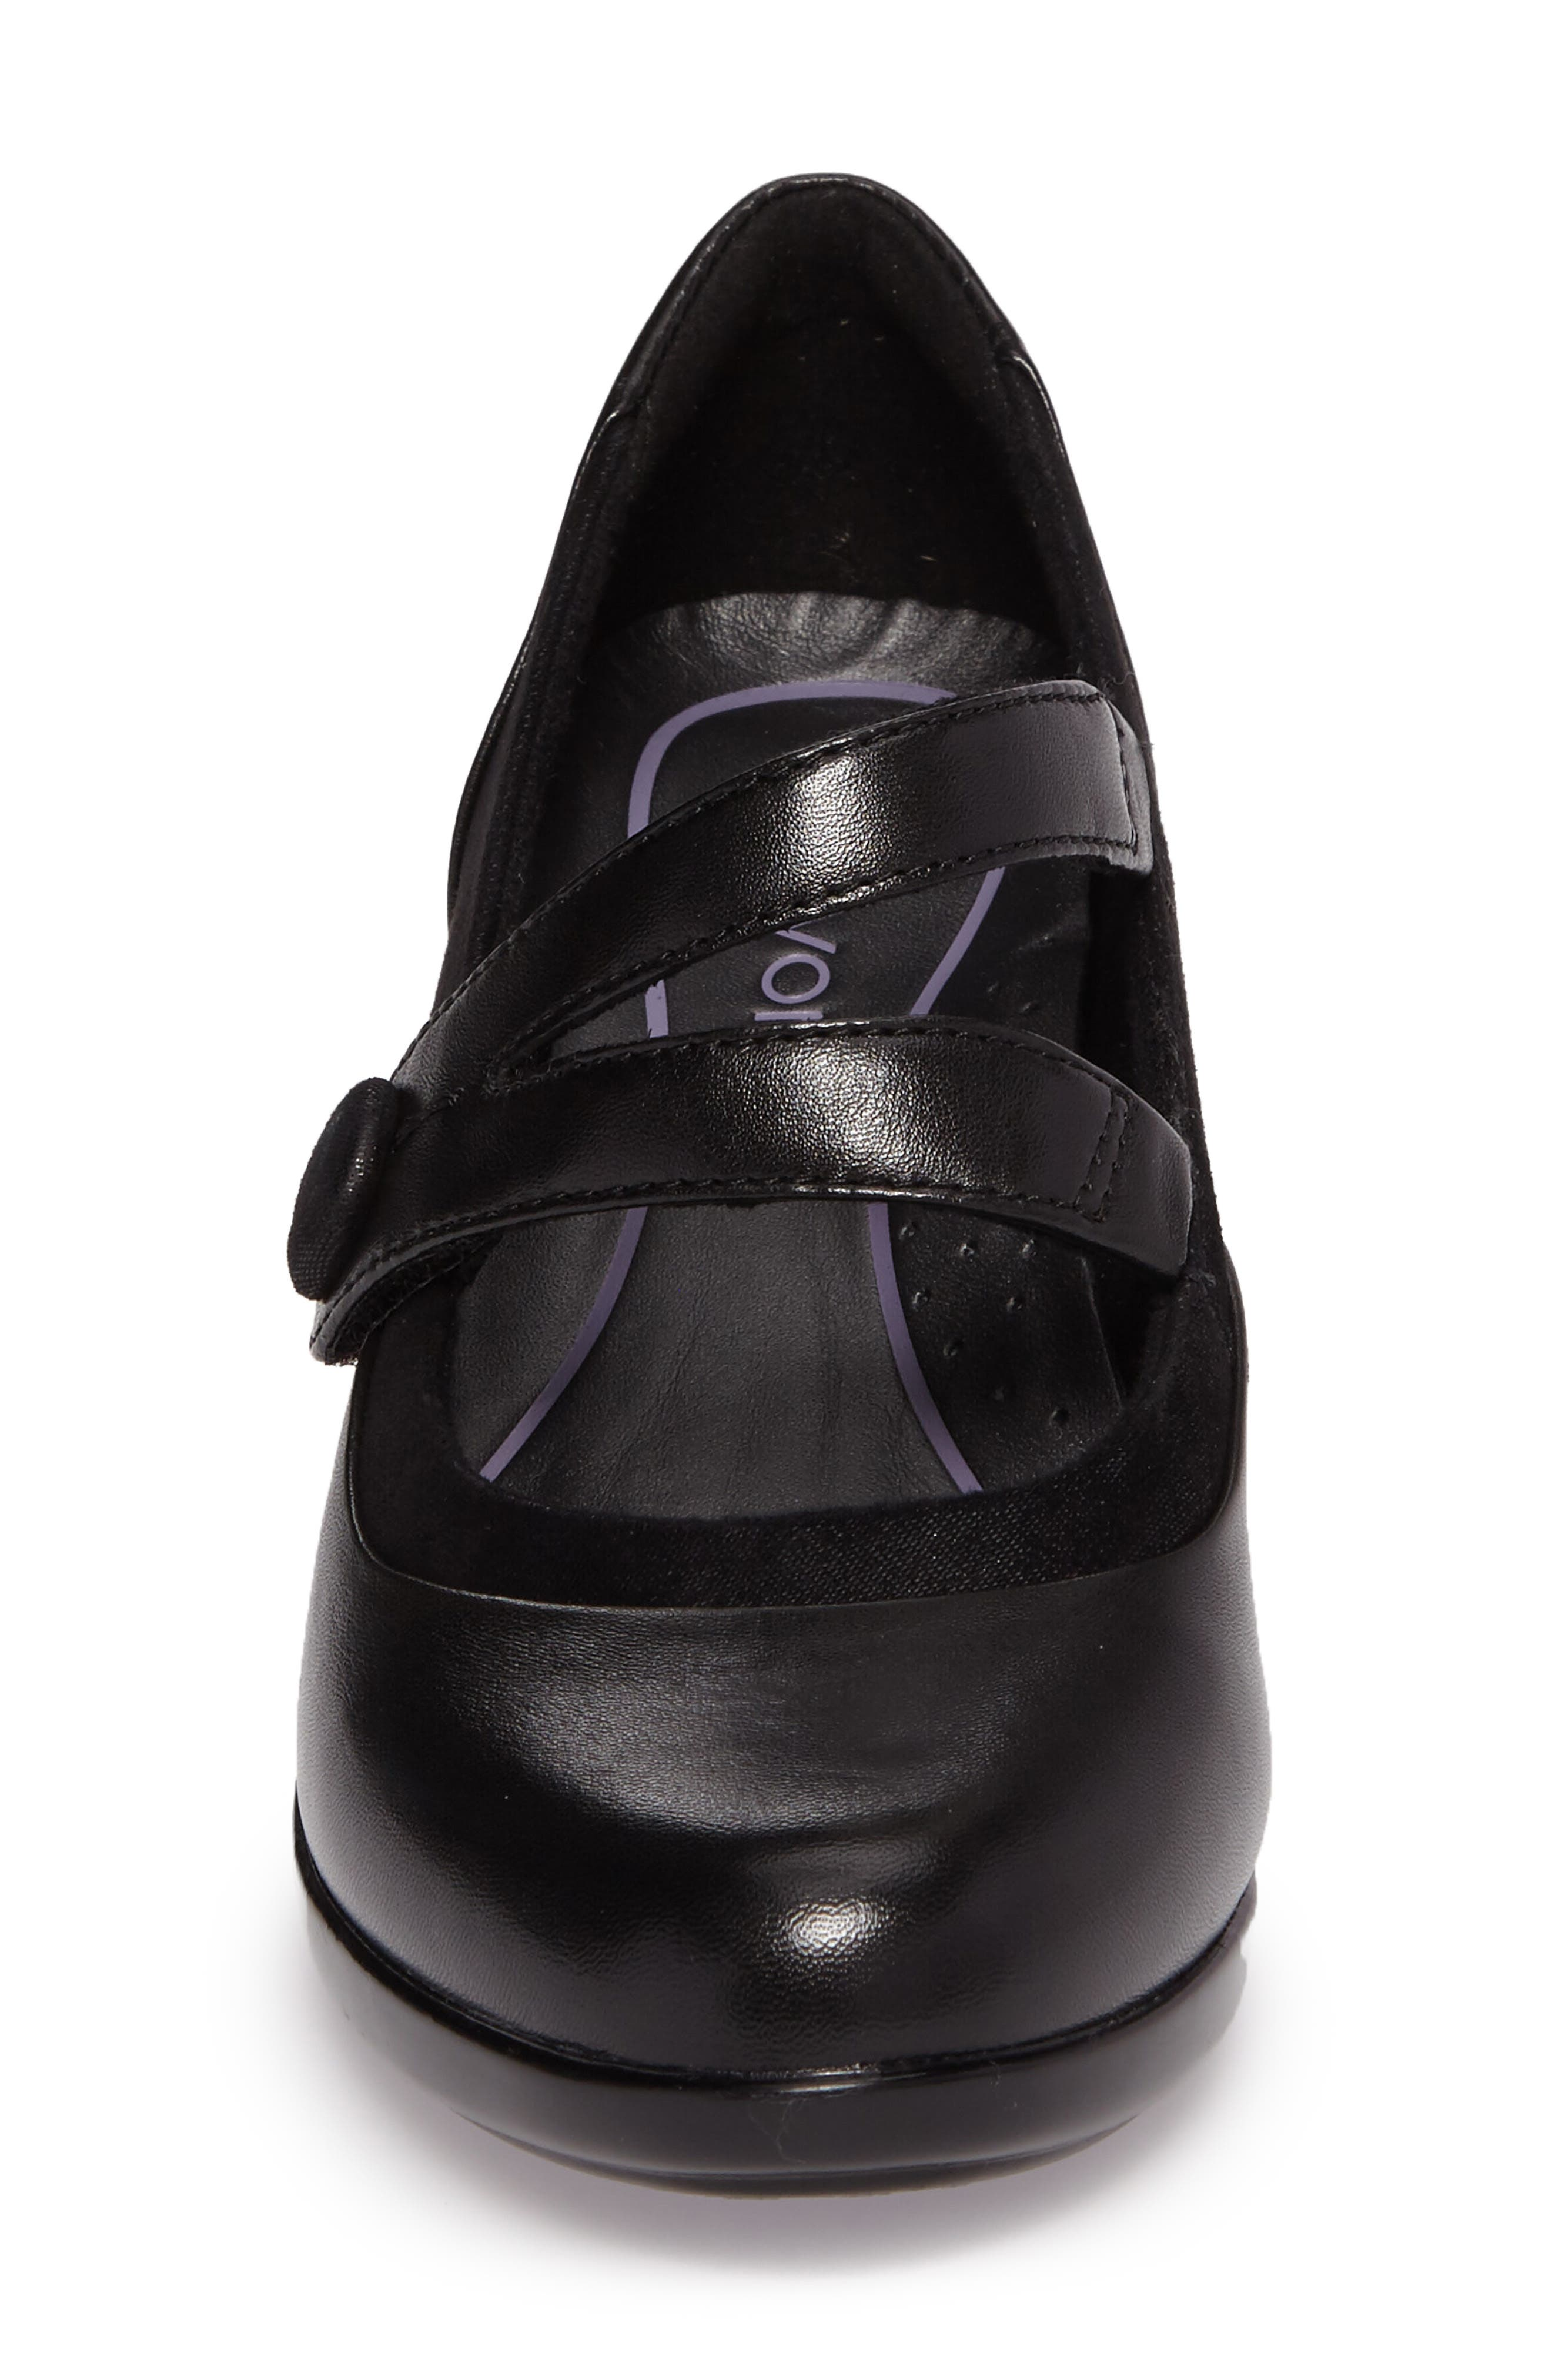 Lexee Mary Jane Pump,                             Alternate thumbnail 4, color,                             Black Leather